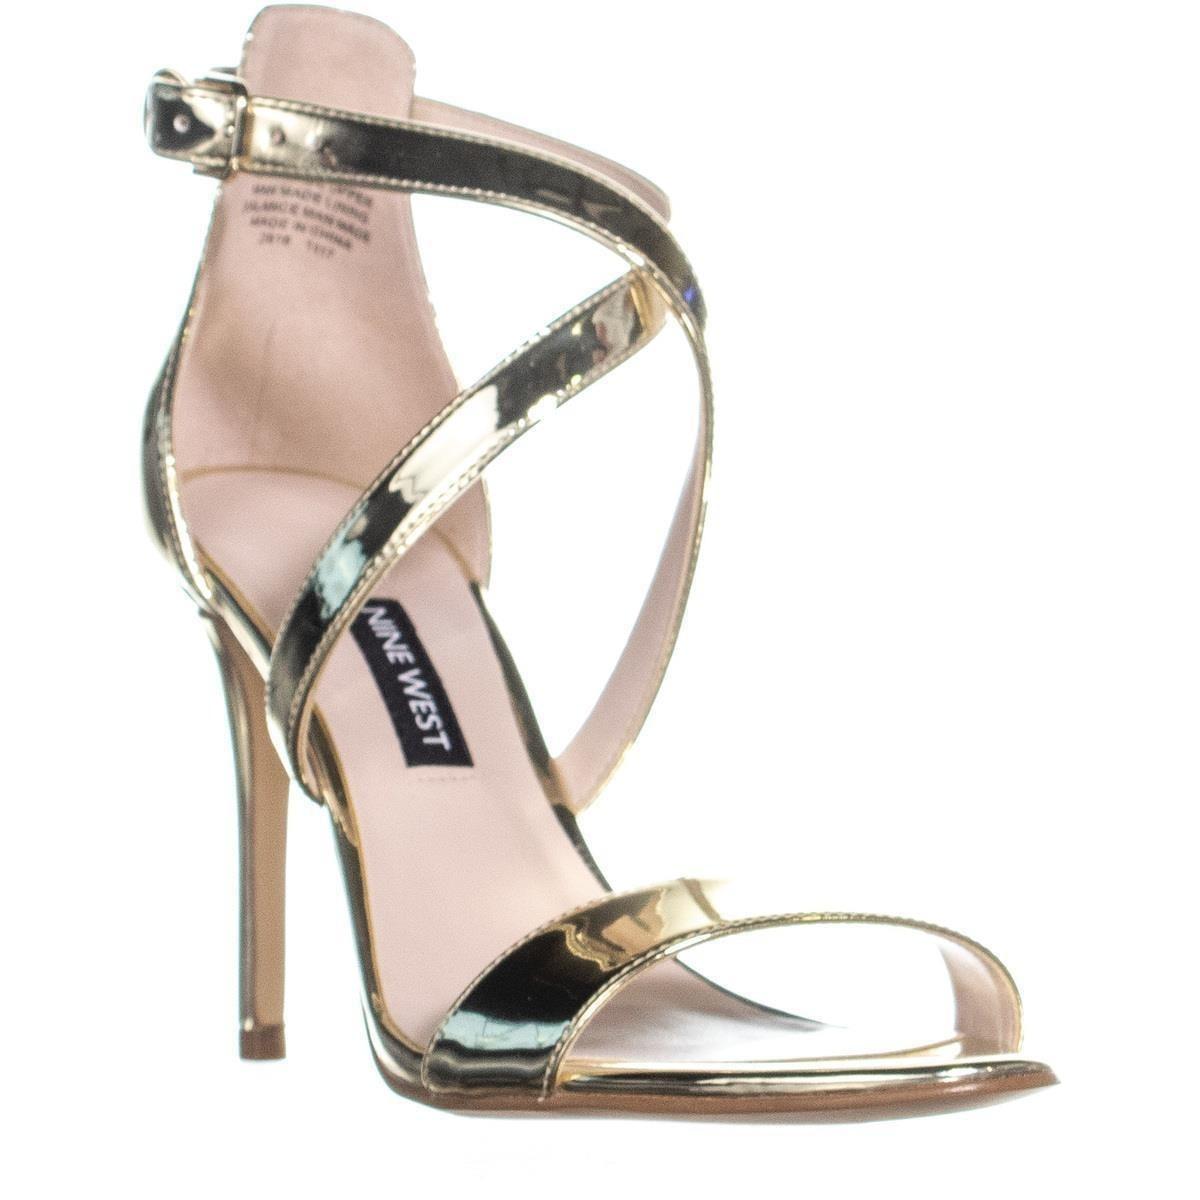 designer fashion convenience goods rock-bottom price Nine West Mydebut Dress Heel Sandals, Light Gold